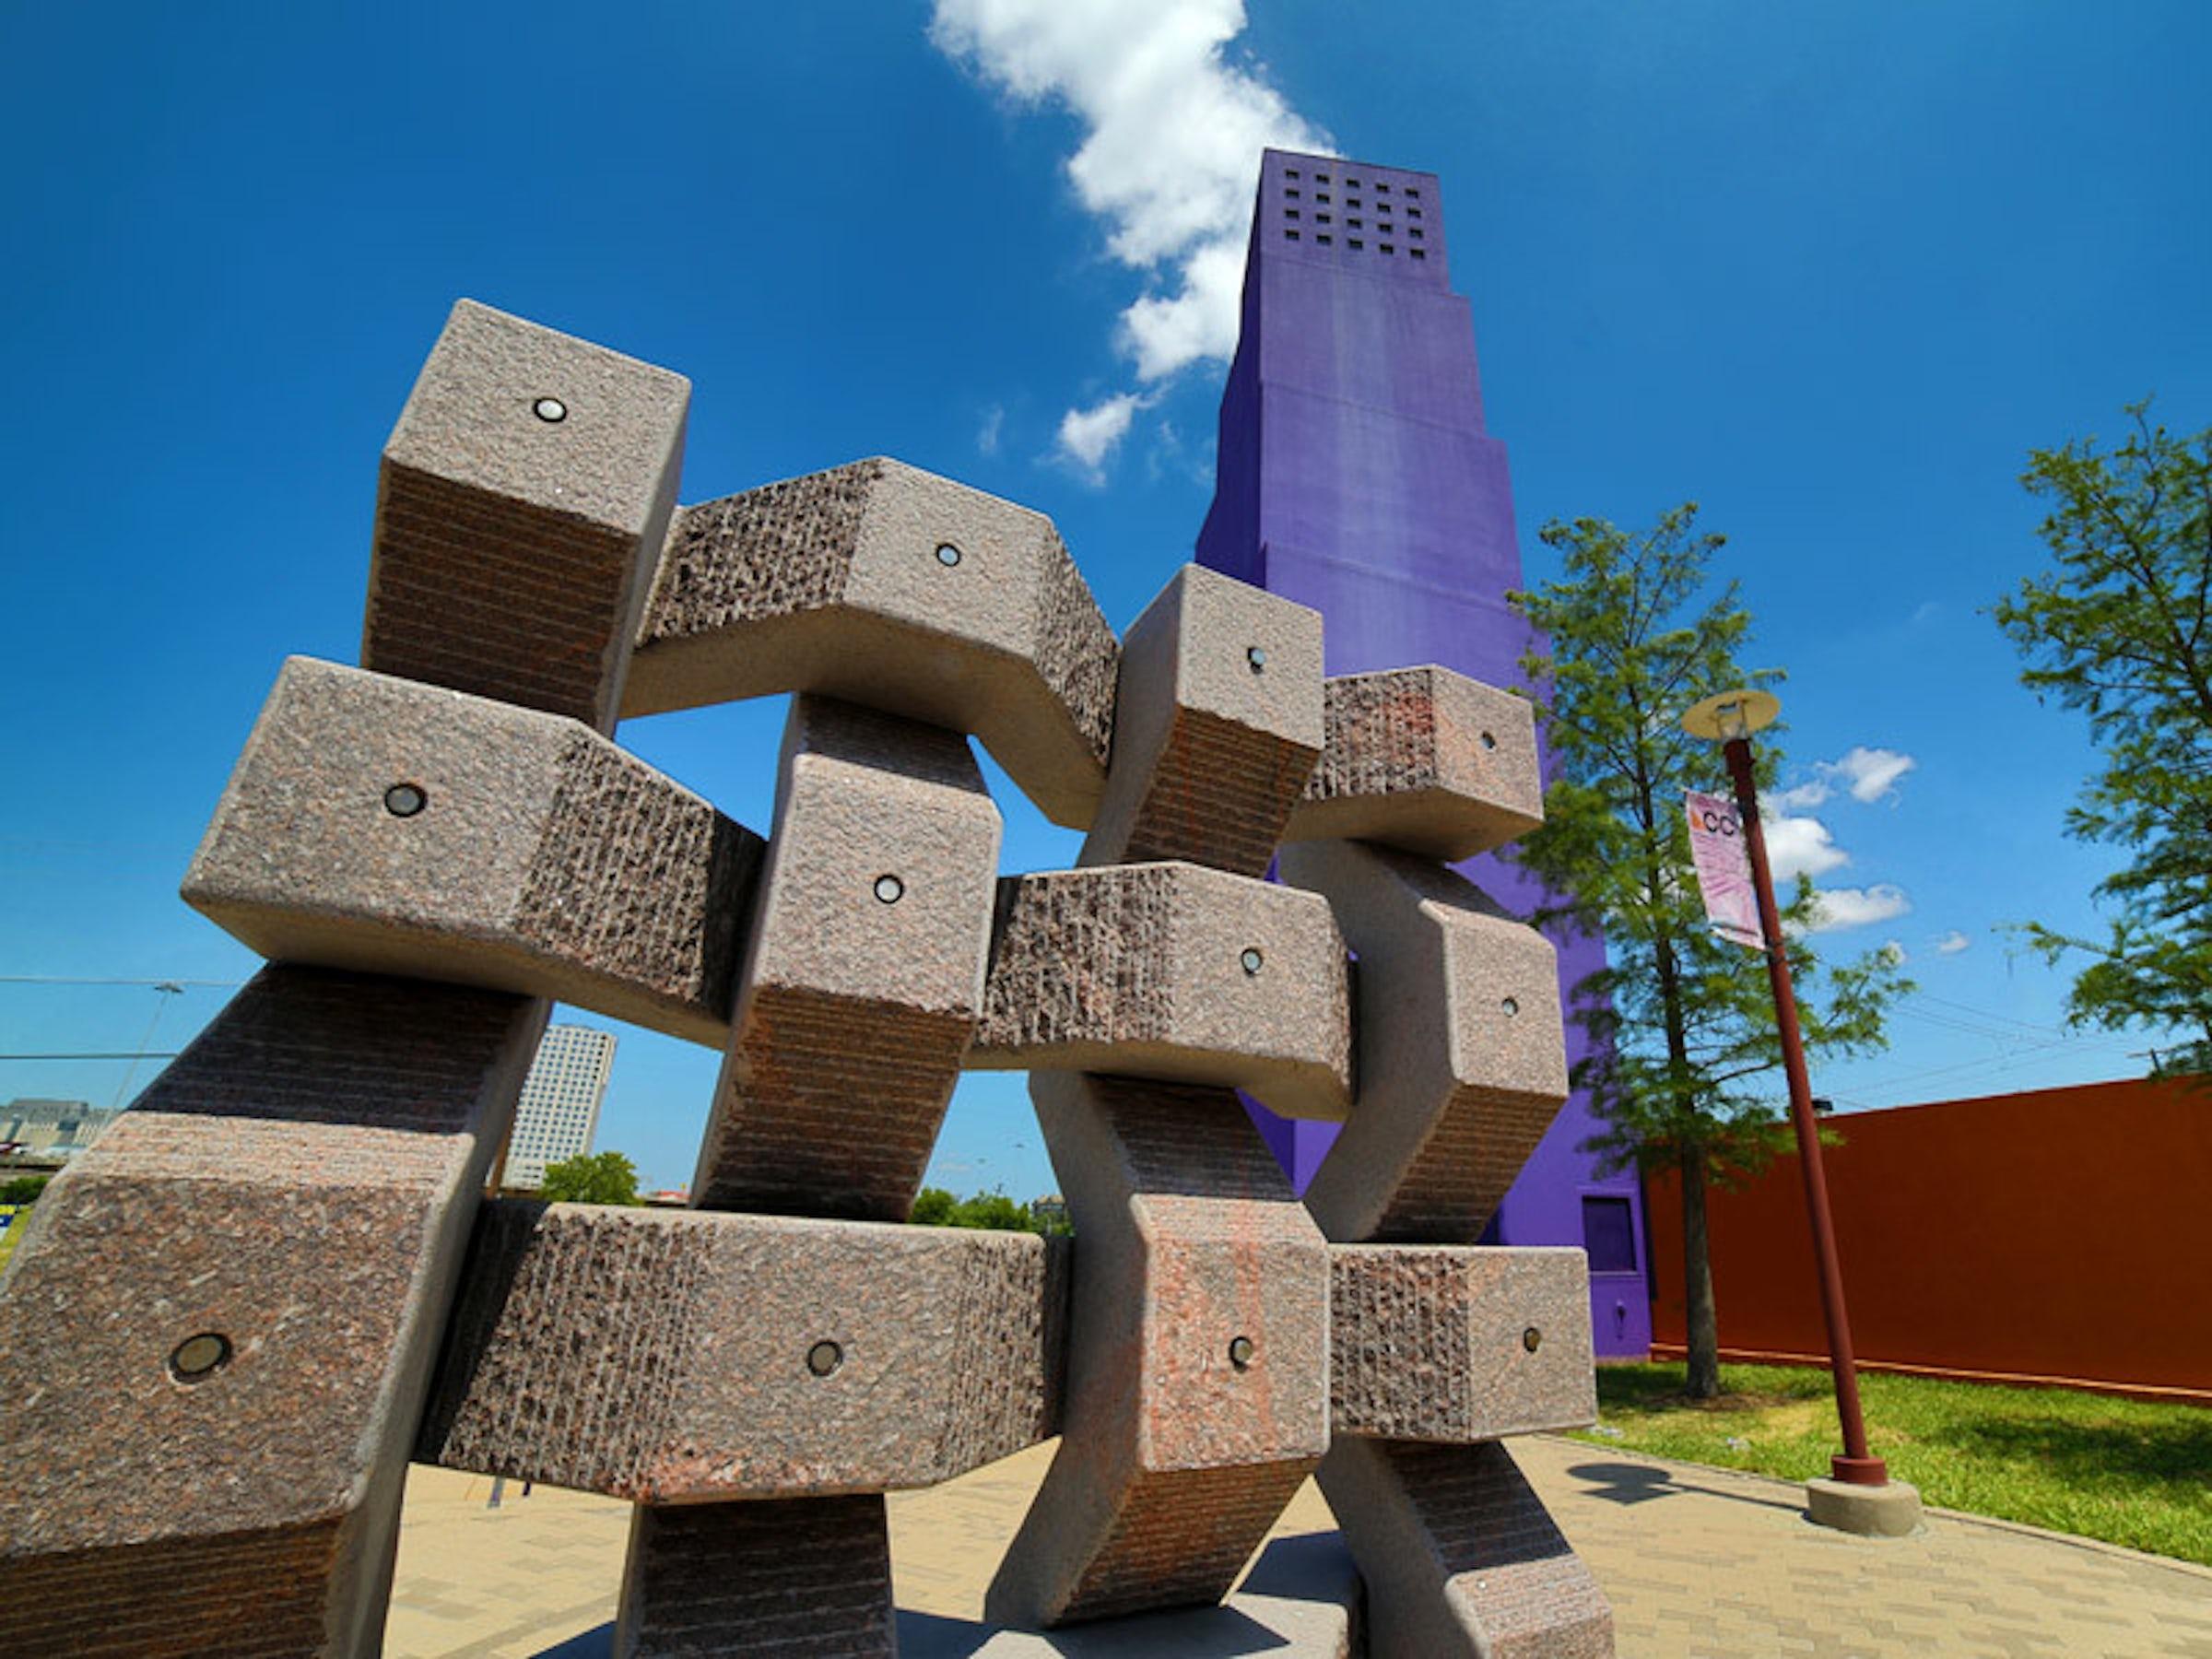 Latino Cultural Center in Beyond Dallas